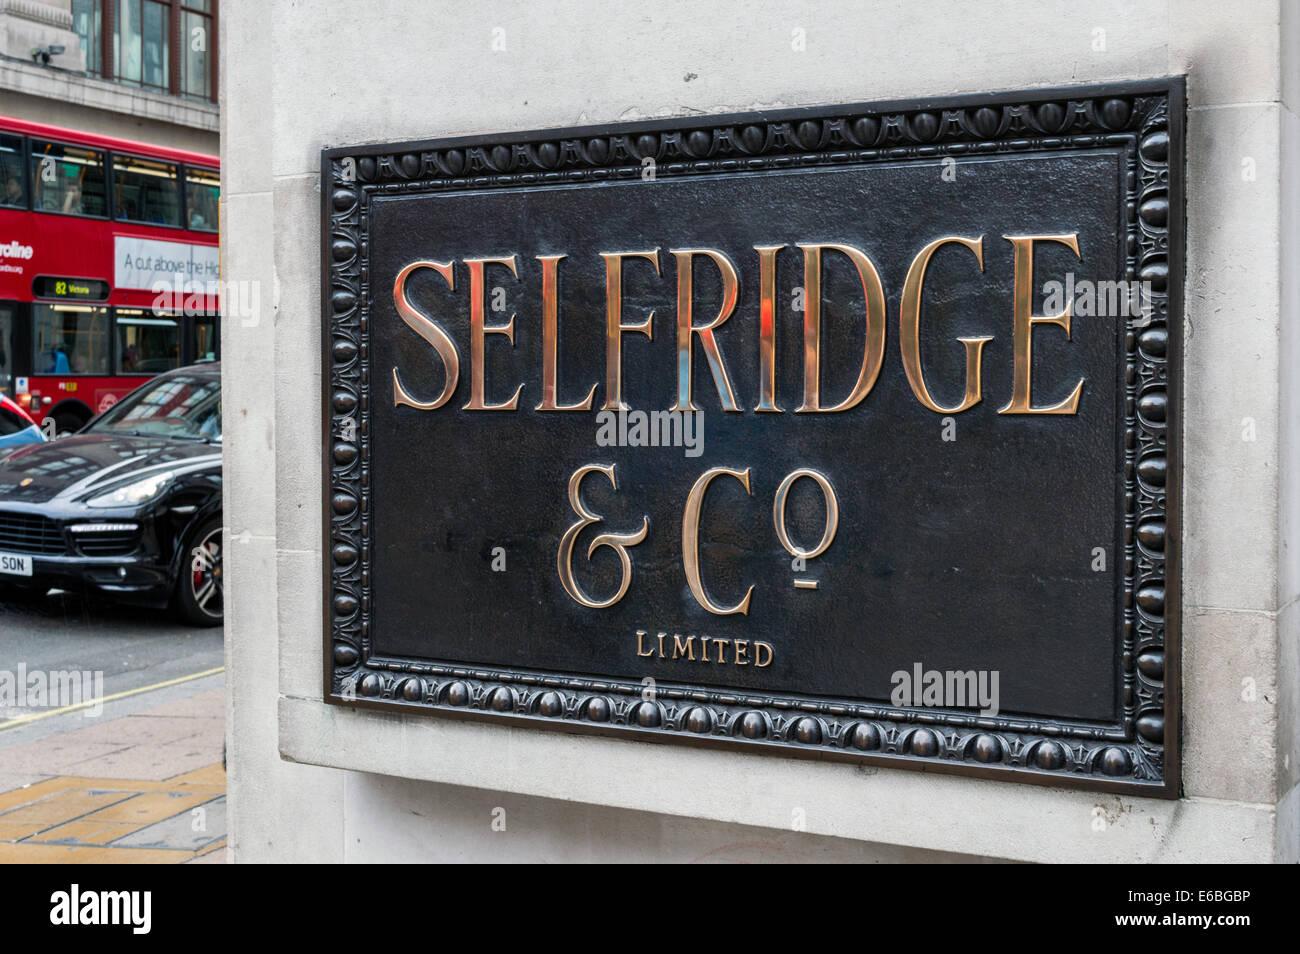 Selfridge & Co plaque on the corner of Selfridges, Oxford Street, London - Stock Image